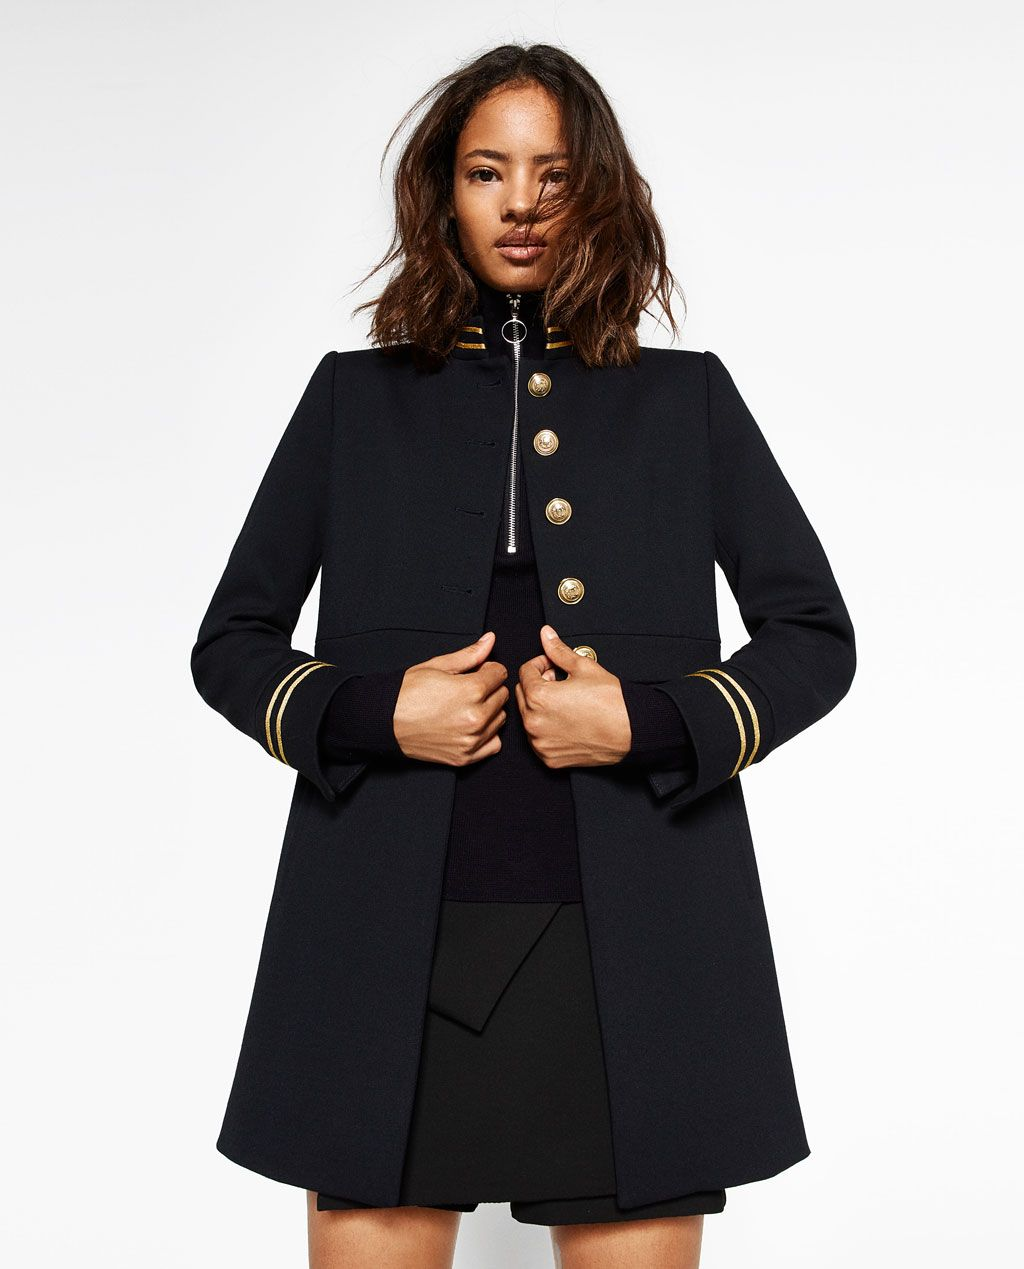 veste style officier femme zara